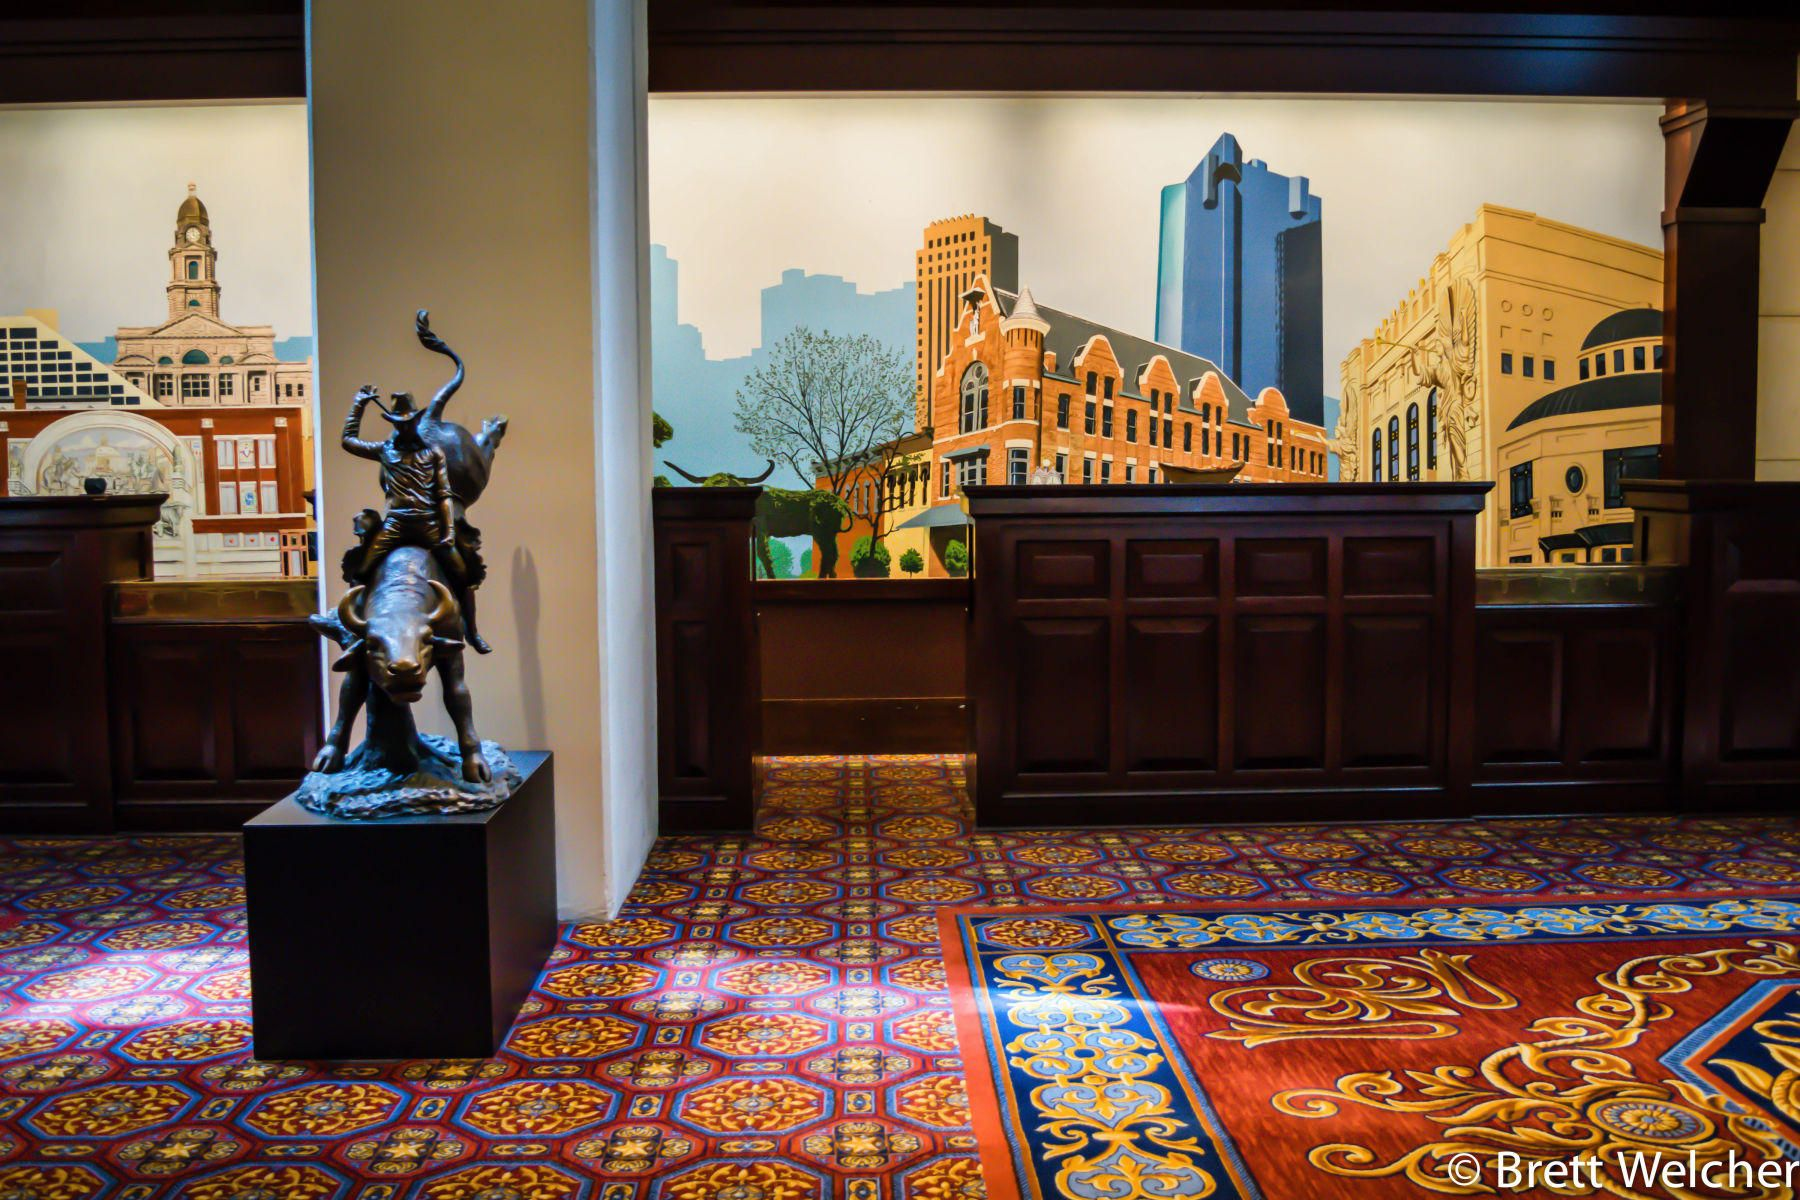 The Worthington Renaissance Lobby - Fort Worth, Texas